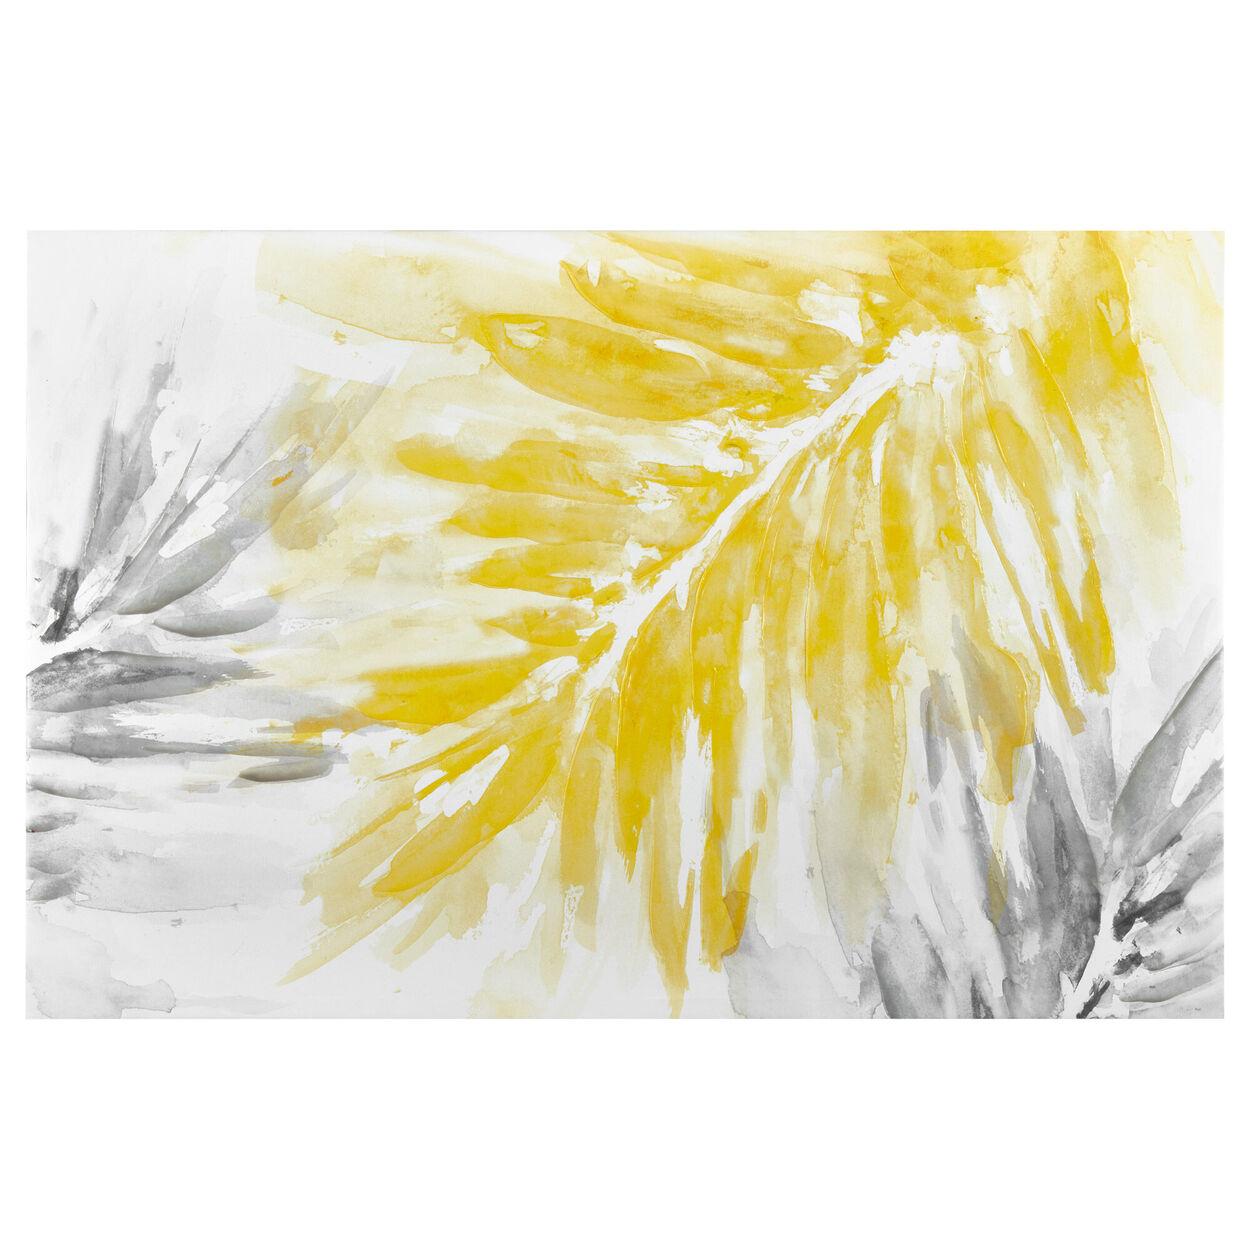 Gel Embellished Palm Leaves Printed Canvas